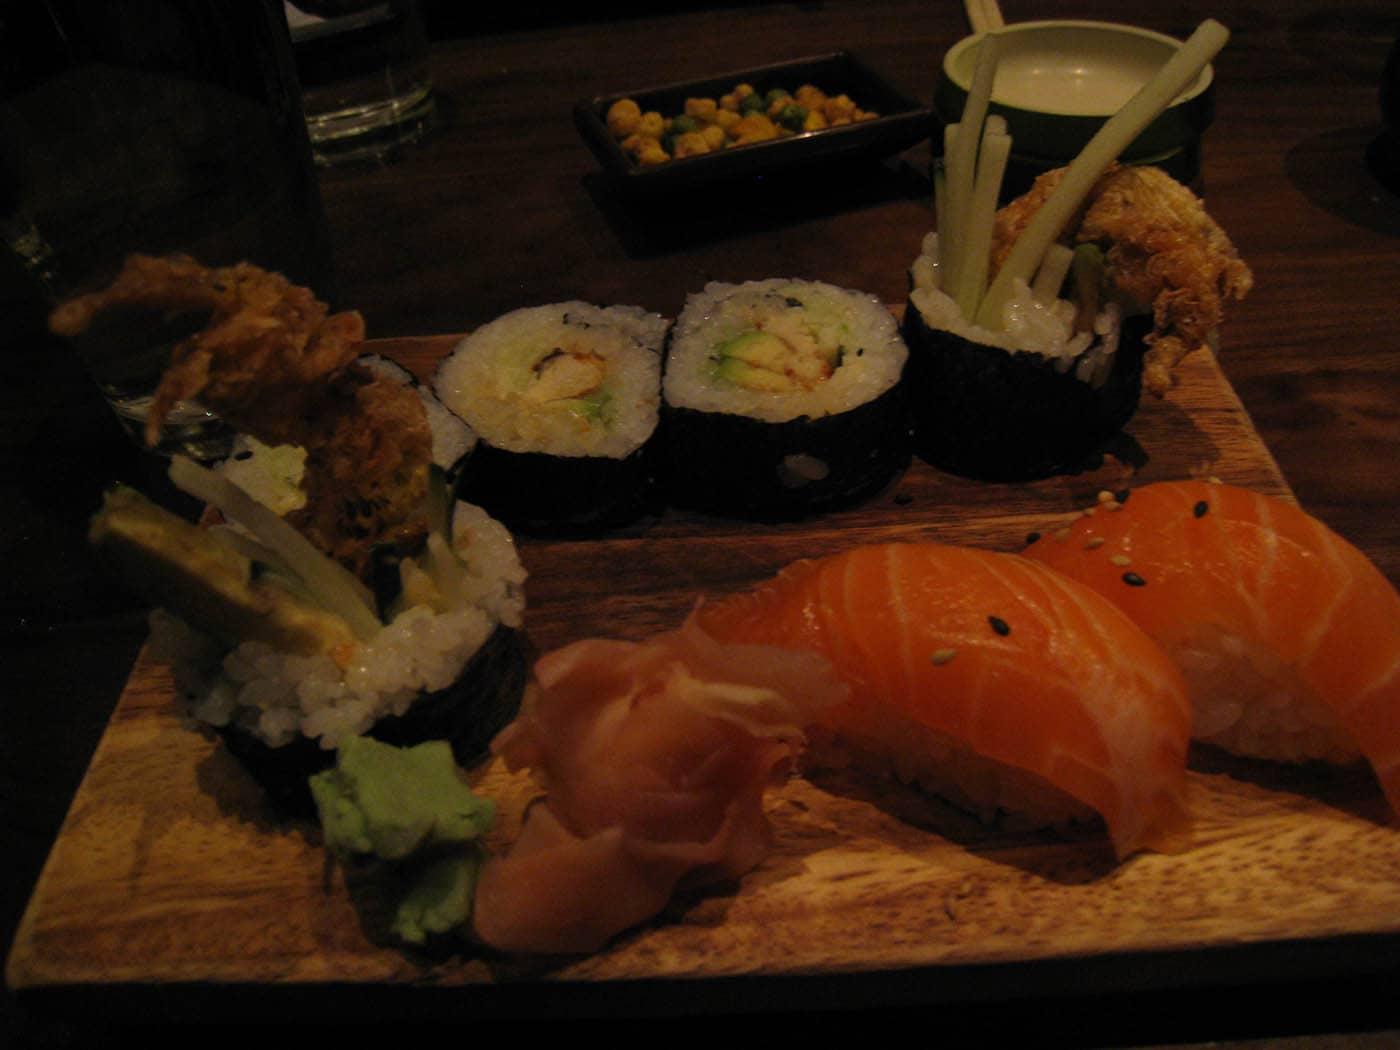 Soft shell crab maki and salmon nigiri. Sushi at Wakamono in Chicago, Illinois.